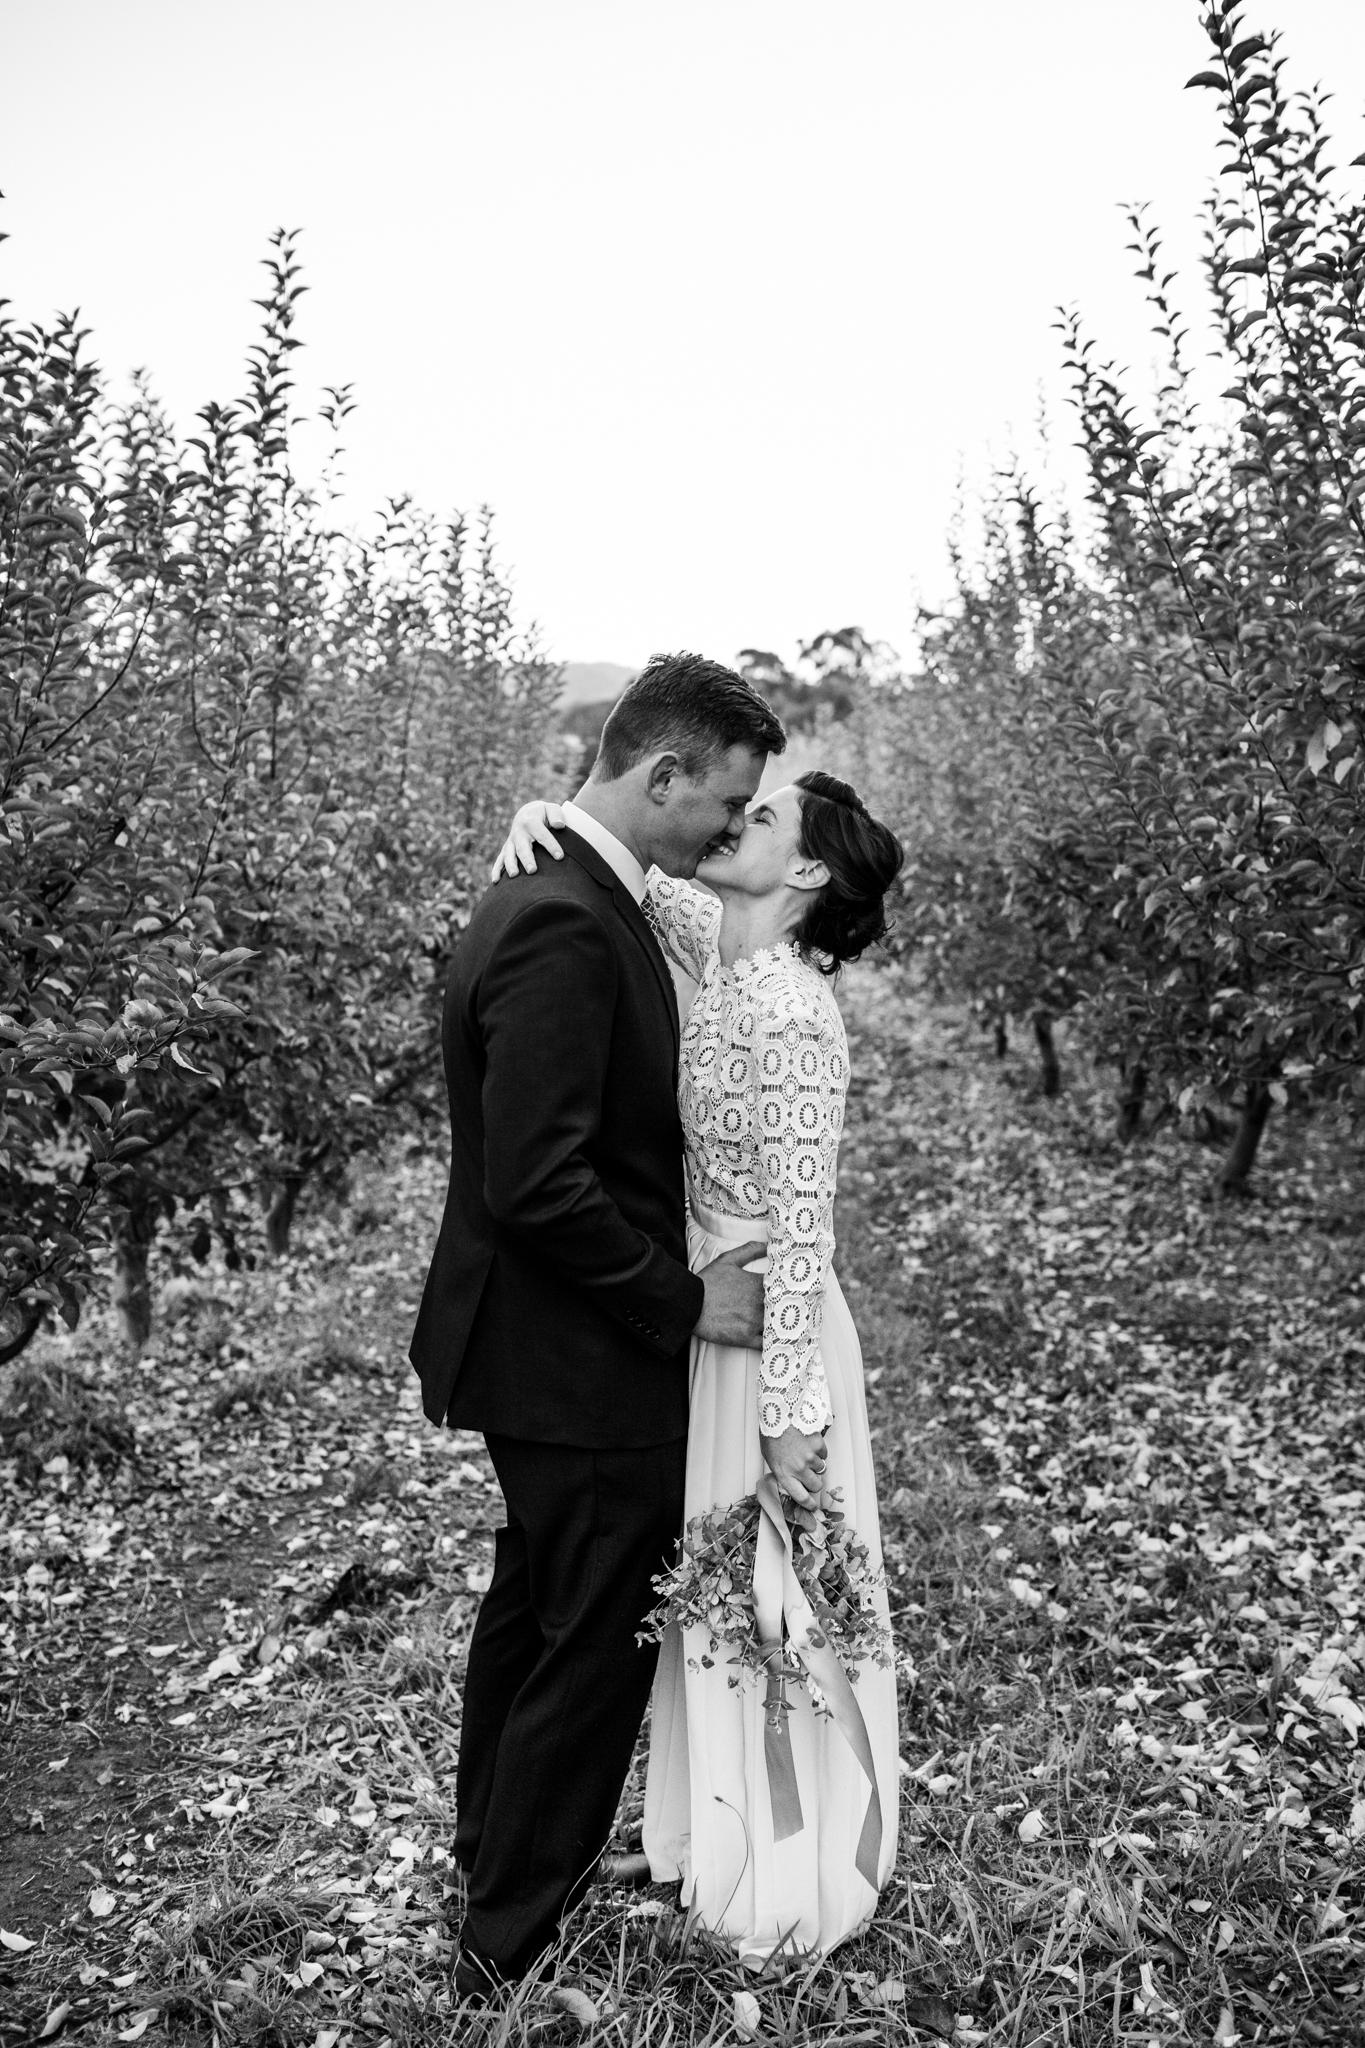 Wedding Borrodell Vineyard - elopement in the vines.